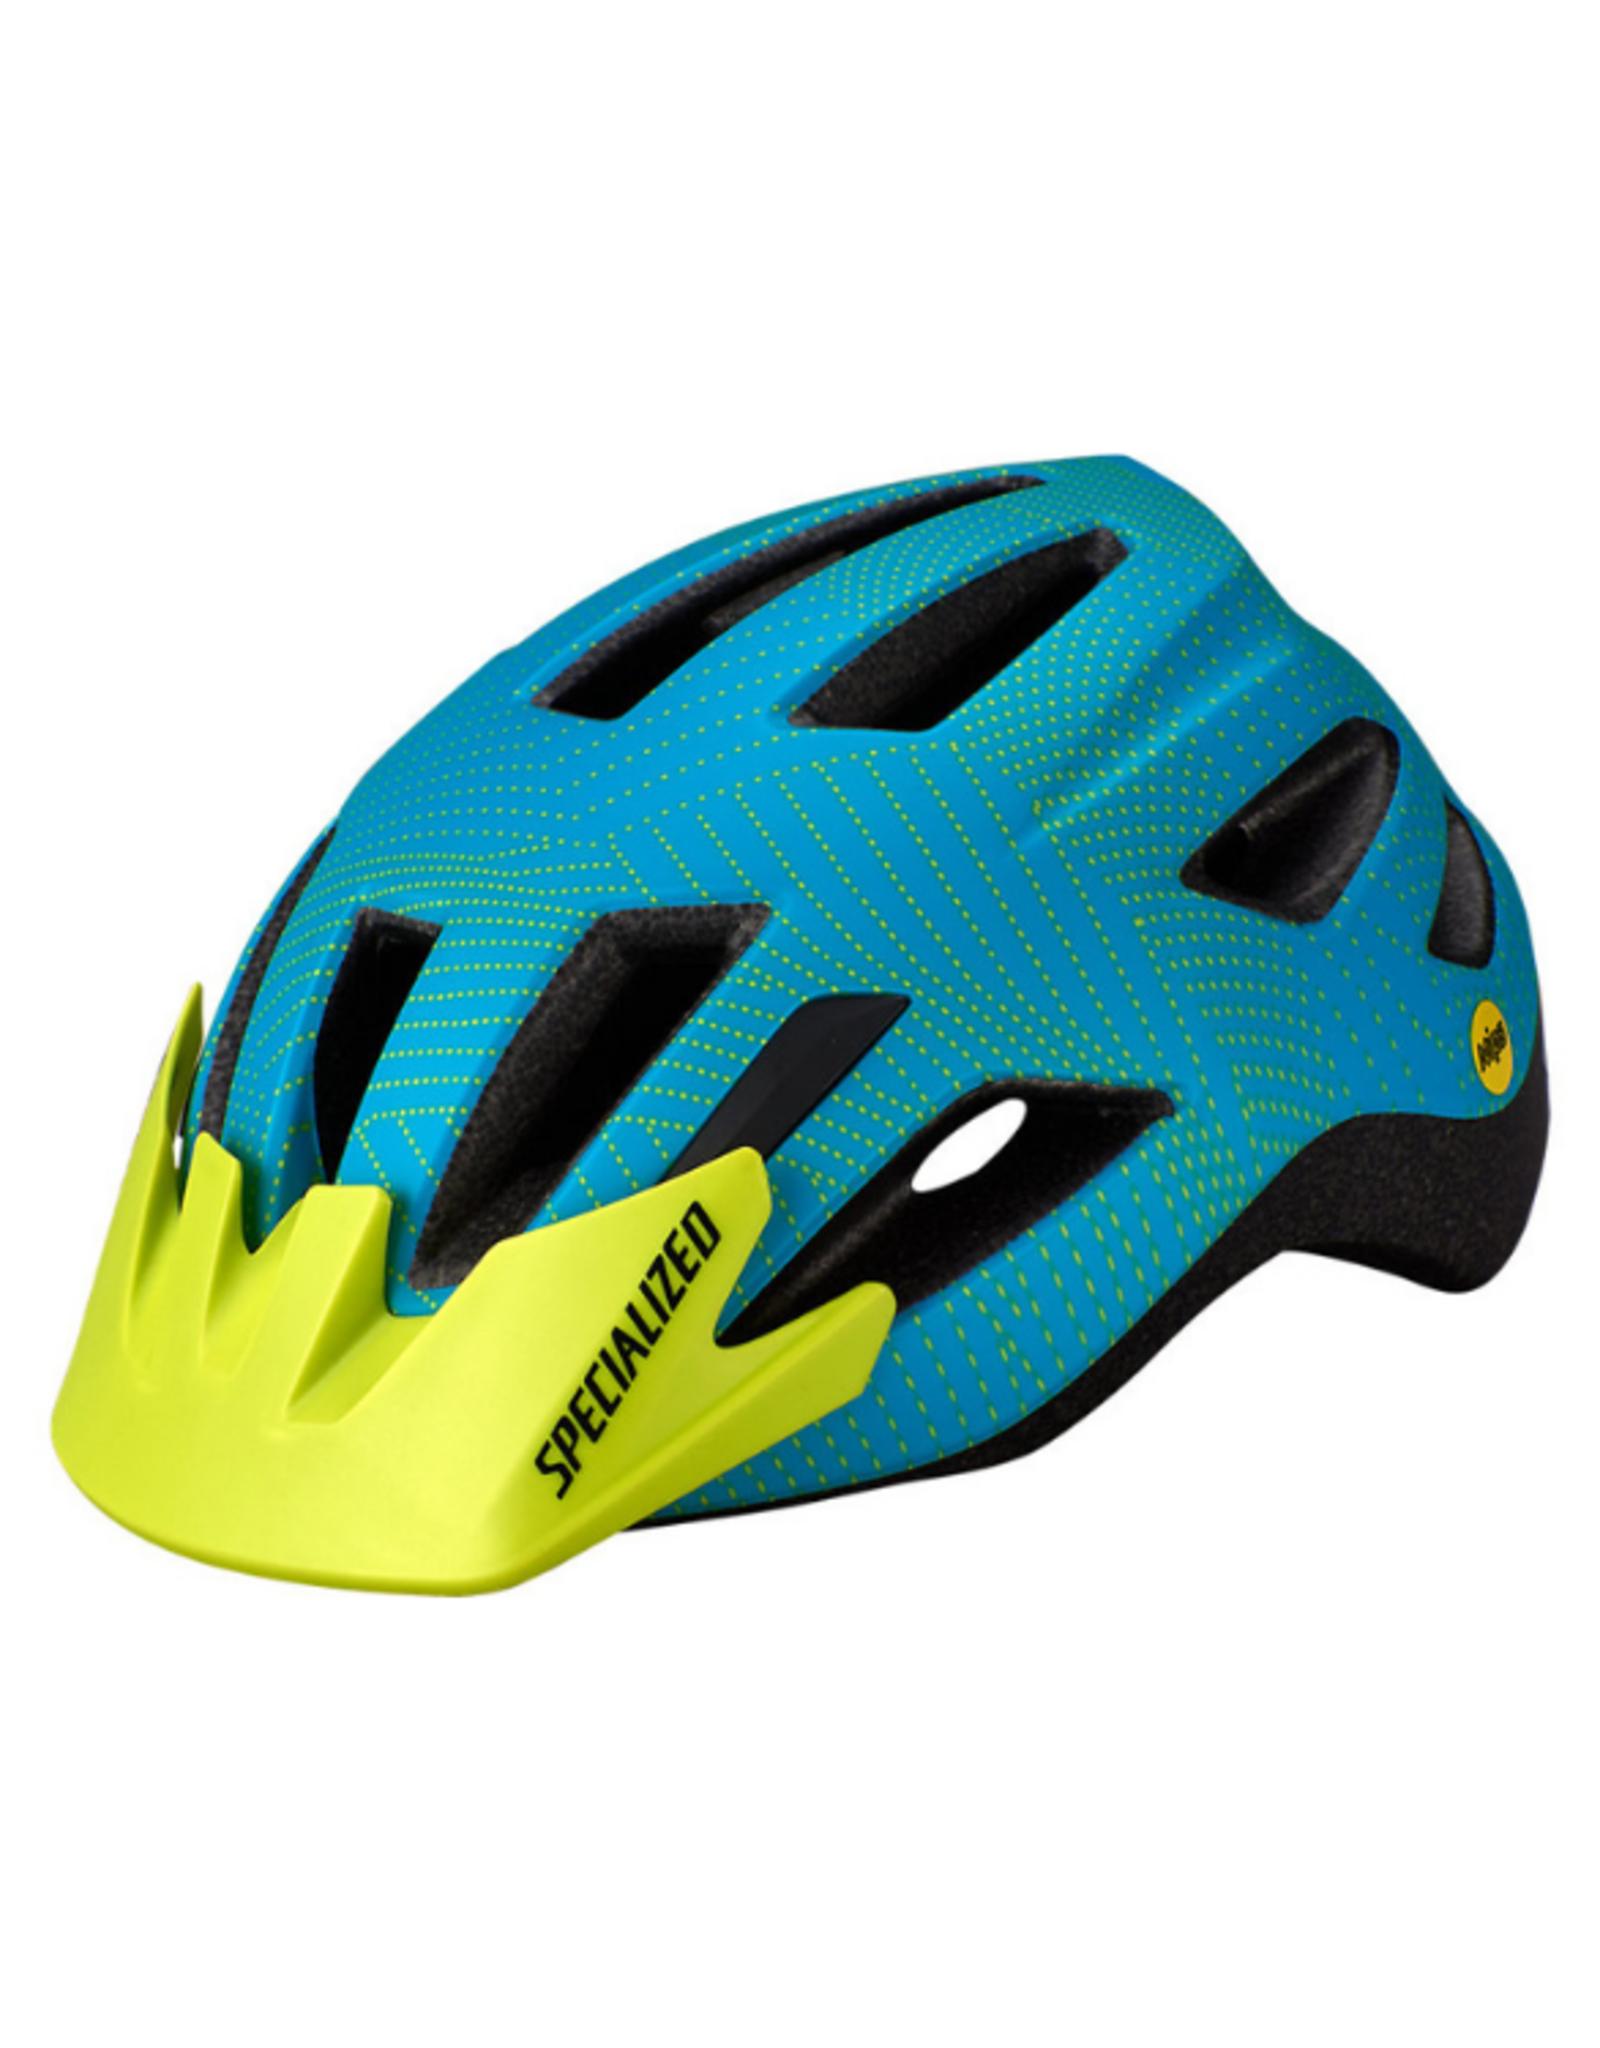 Specialized 2021 Shuffle SB Child (4-7Y) Bike Helmet